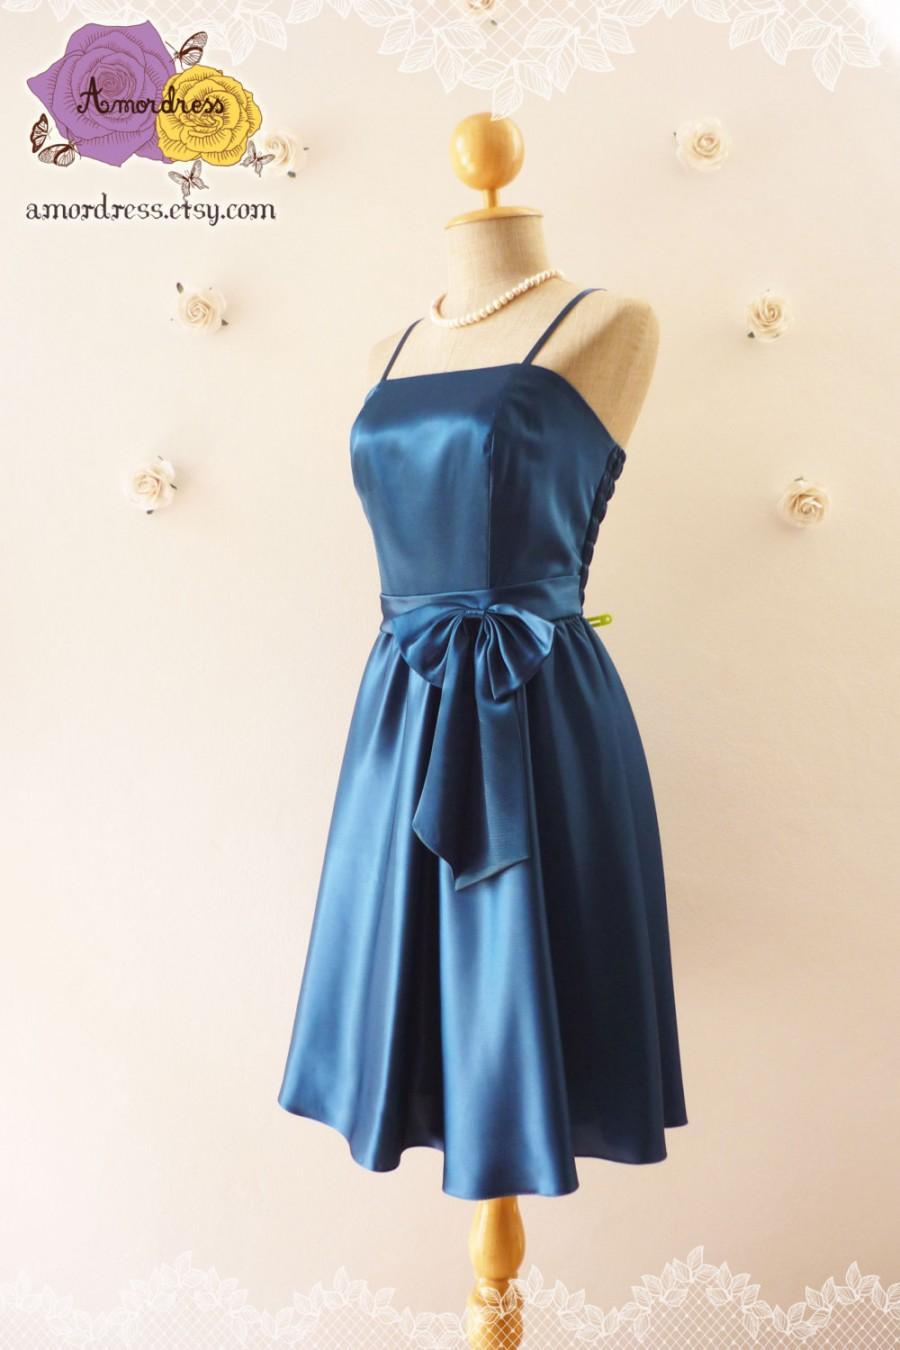 Mariage - SALE Midnight Blue Party Dress Elegant Vintage Inspired Party Prom Bridesmaid Wedding Cocktail Evening Dress Romantic Princess Romance